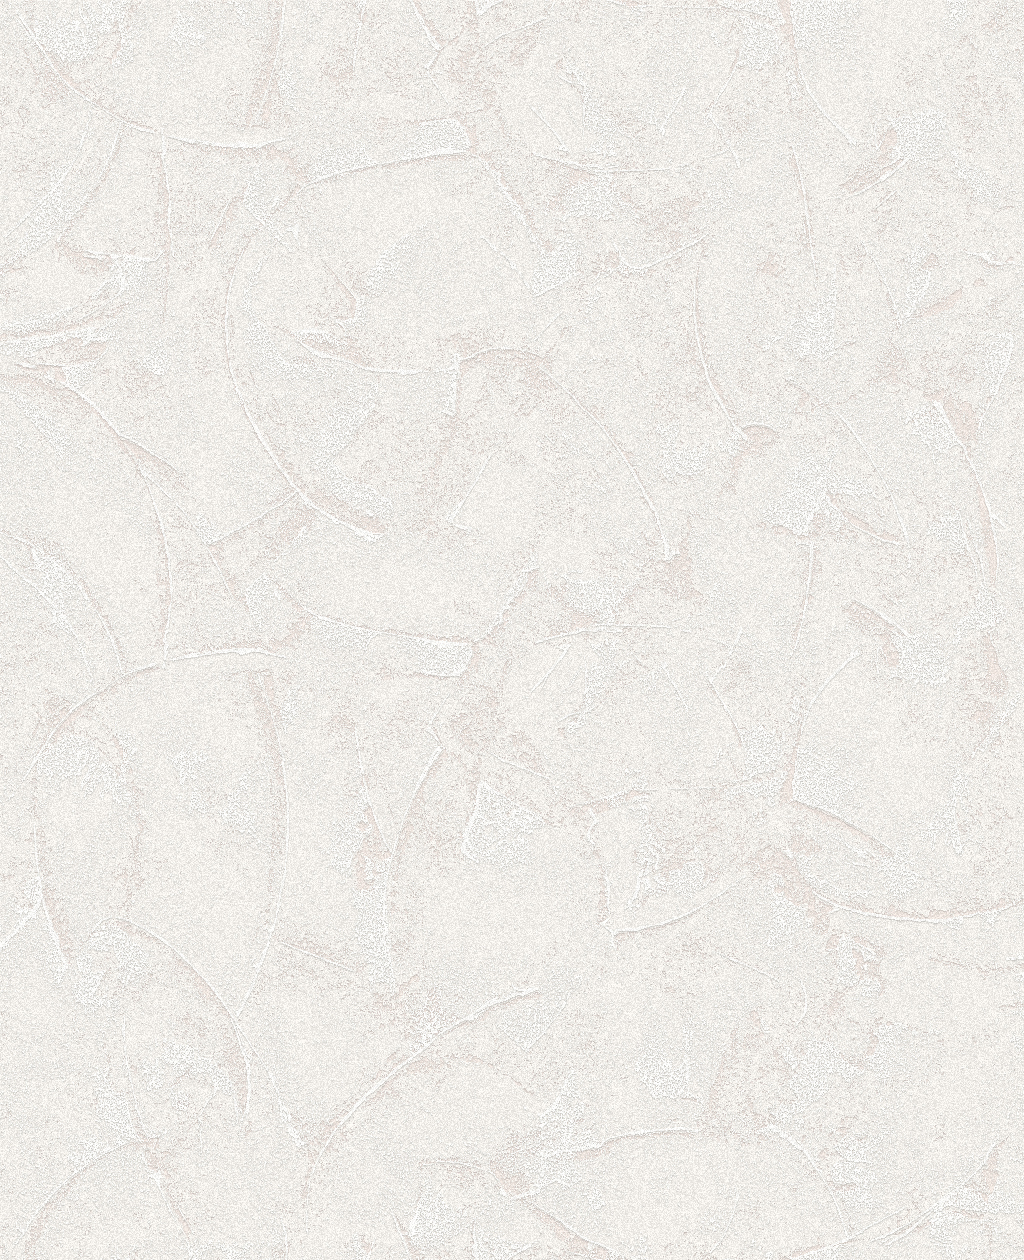 Stucco Effect Paintable Wallpaper   designer wallcovering   Designer 1024x1260